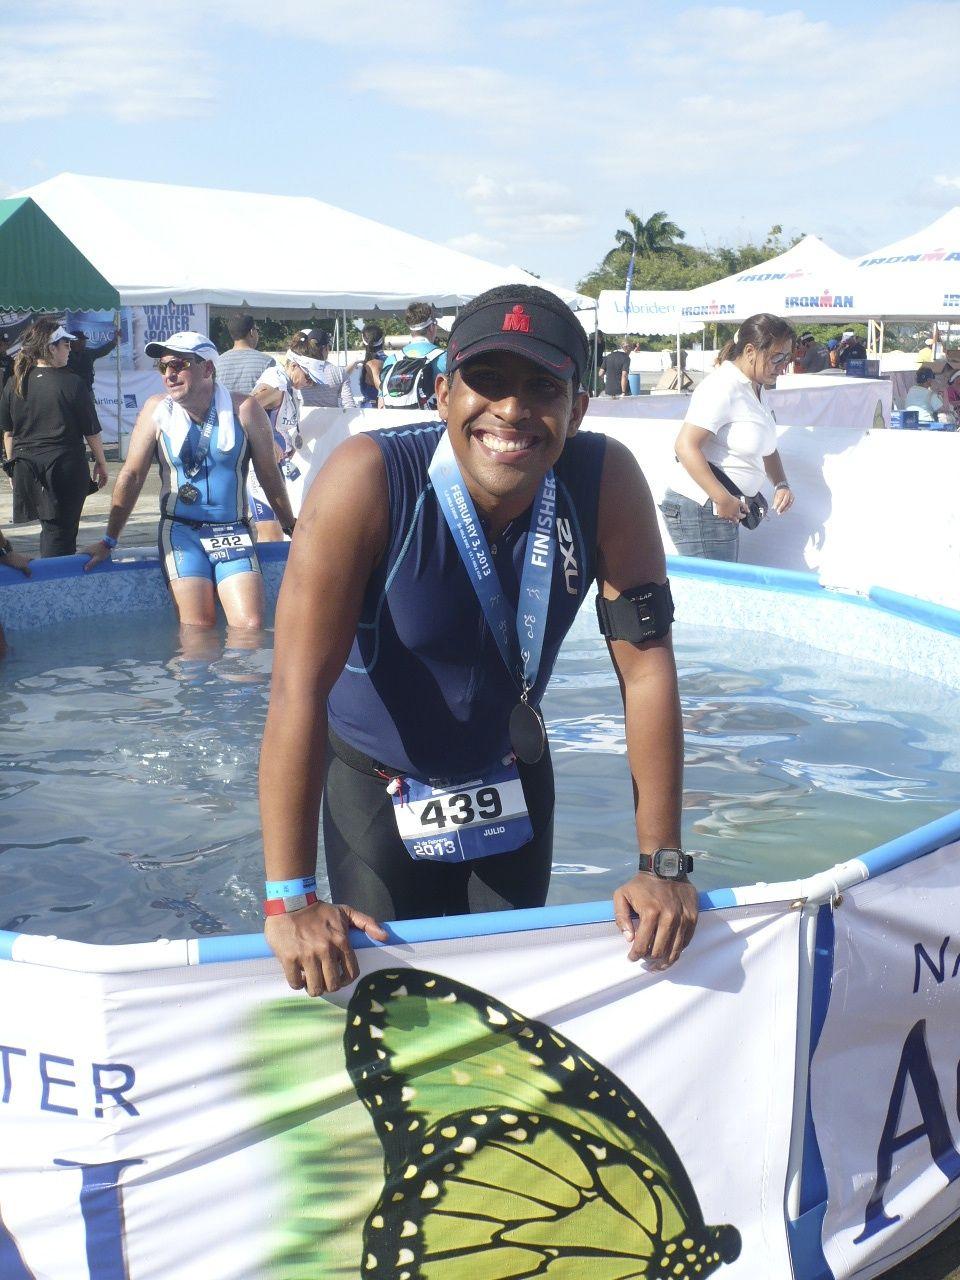 Mi medalla del Ironman 70.3 de Panama